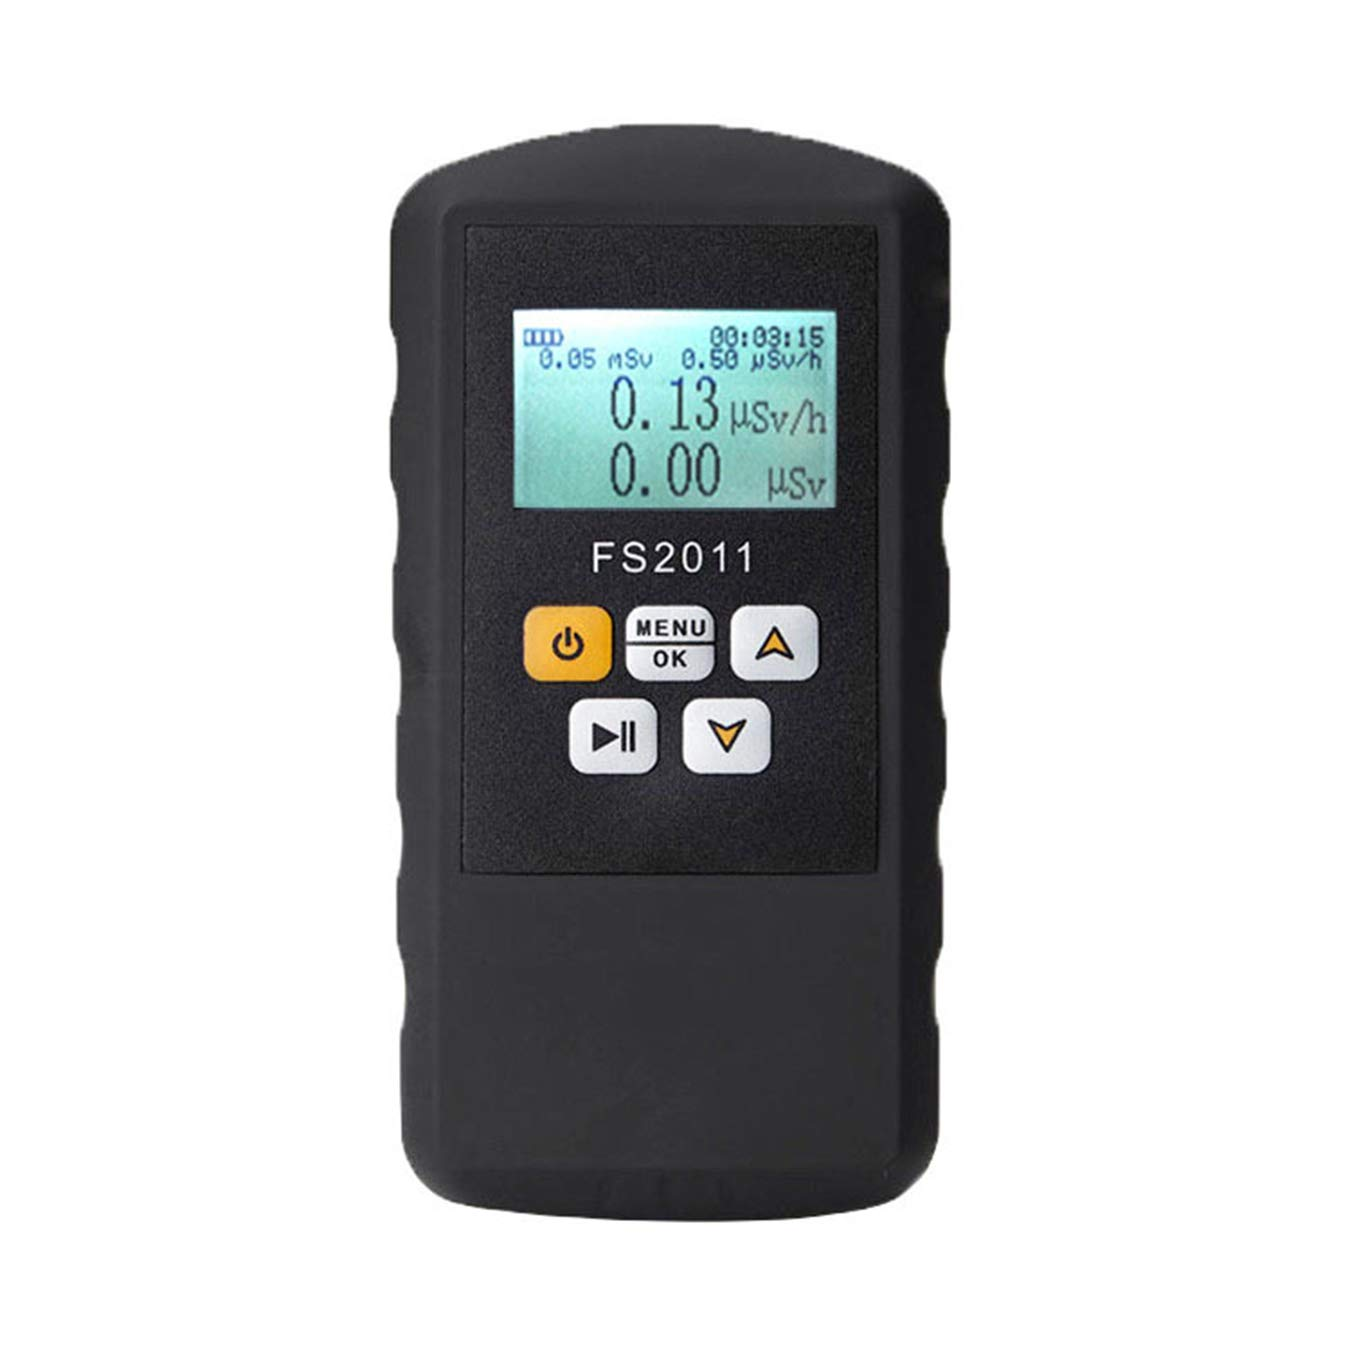 Operation Instruction Manual of FS2011 Individual Dosage Alarm Device